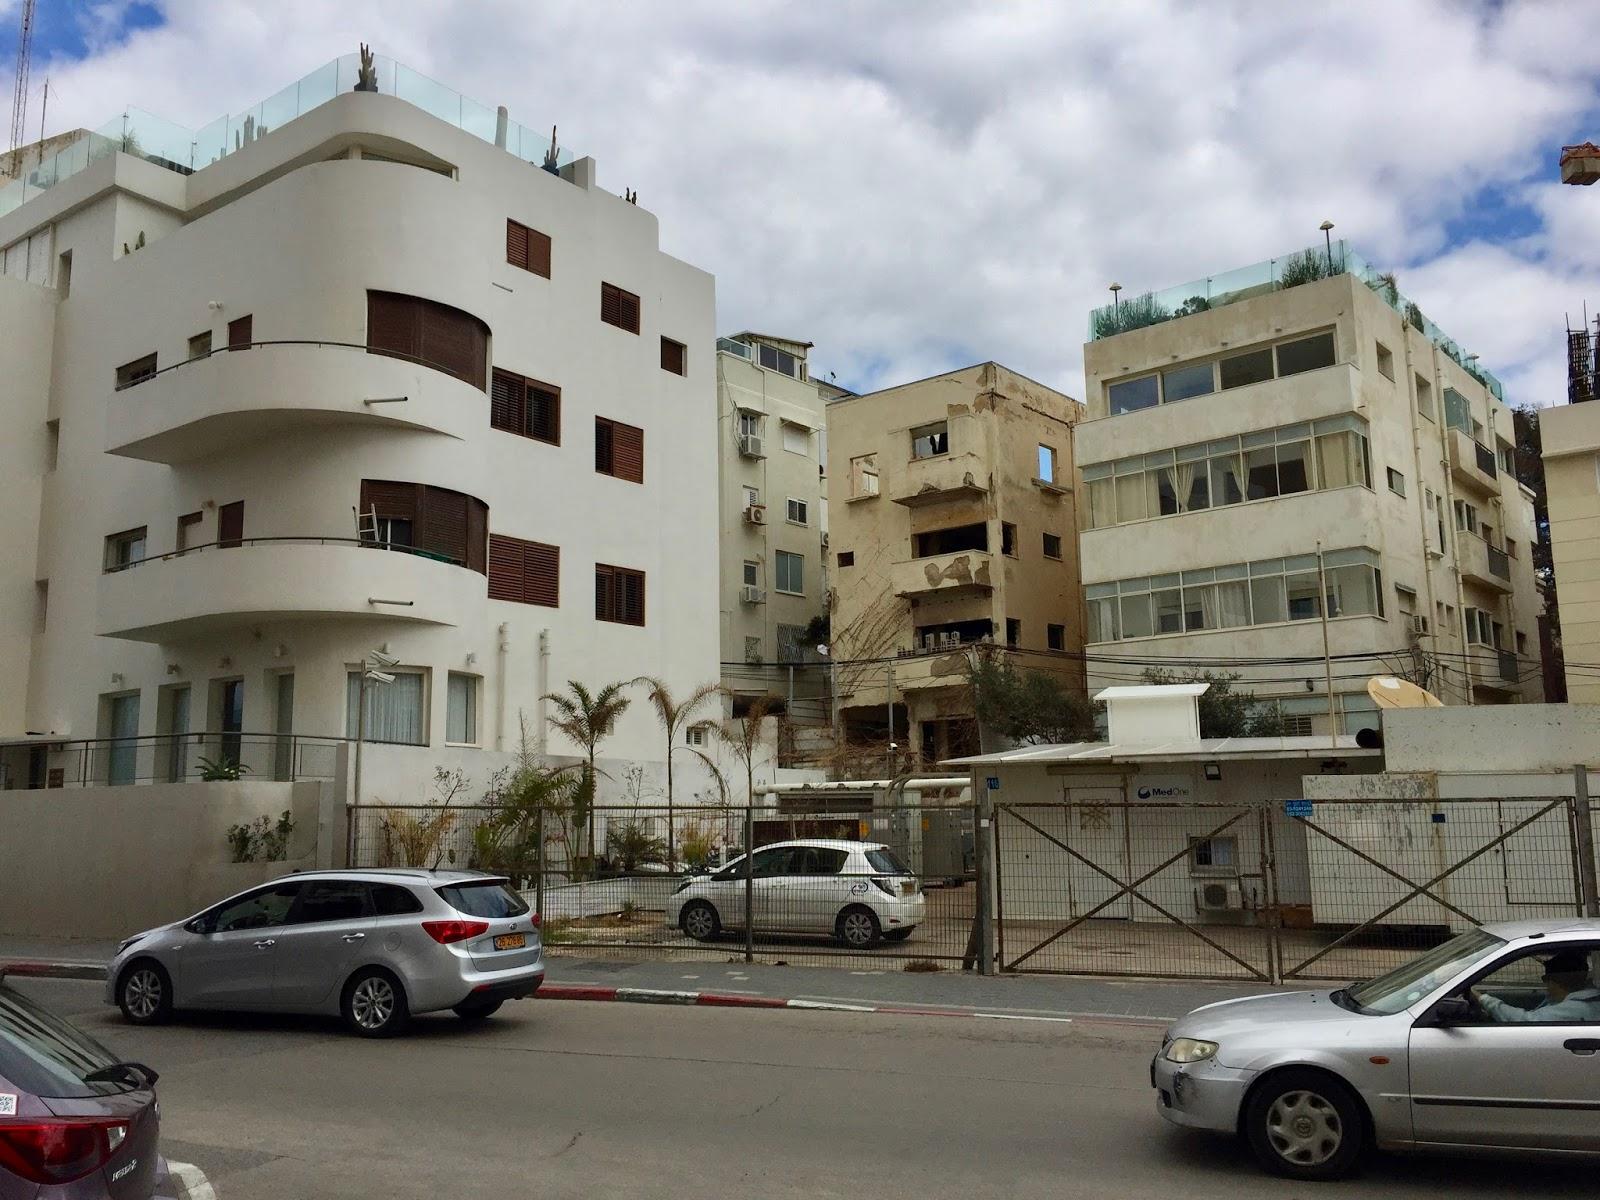 Ulice v Tel Avivu